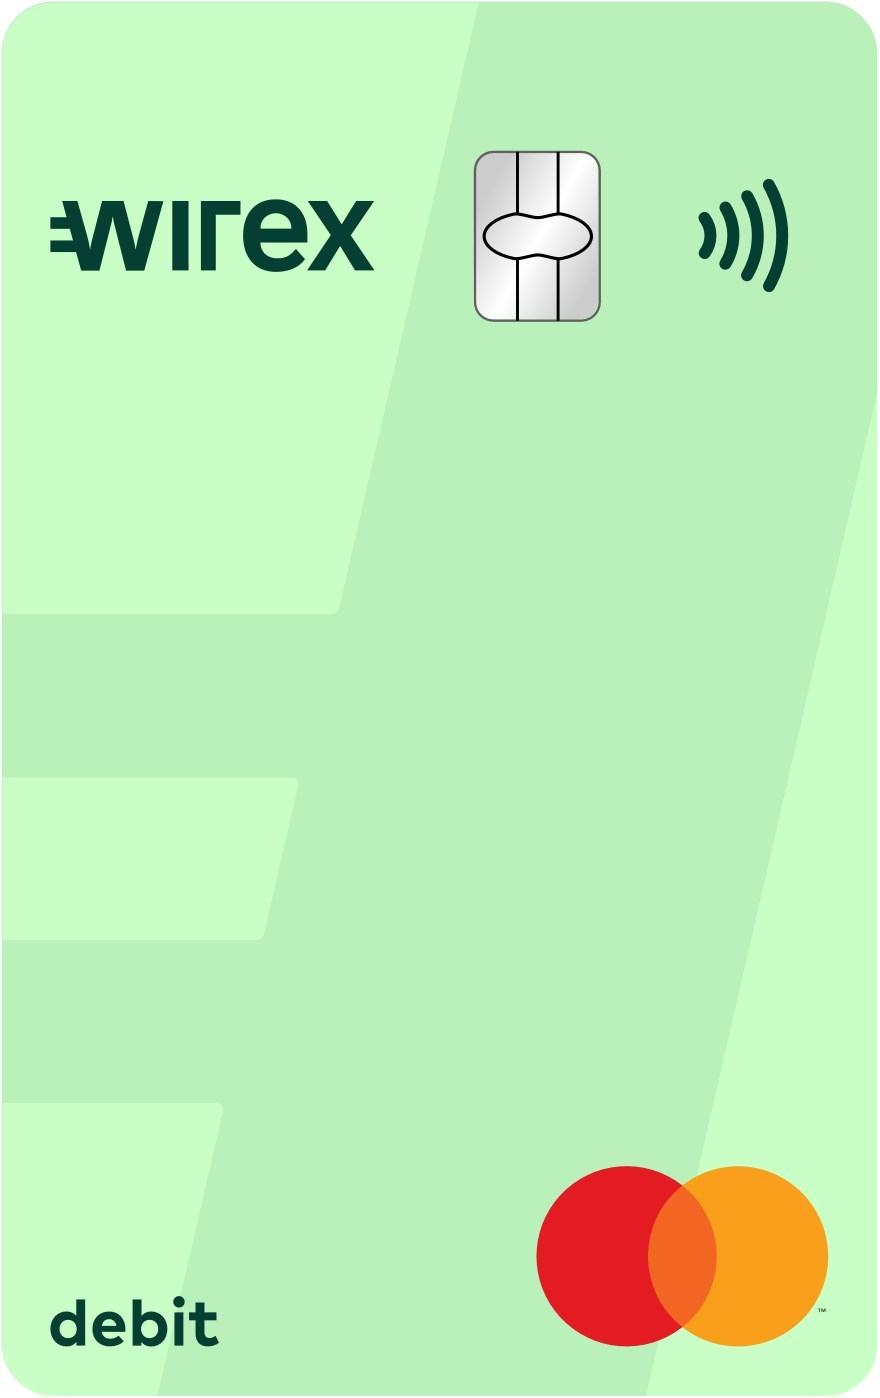 Wirex Becomes World's First Crypto-Native Platform to Secure Mastercard Principal Membership (PRNewsfoto/Wirex)